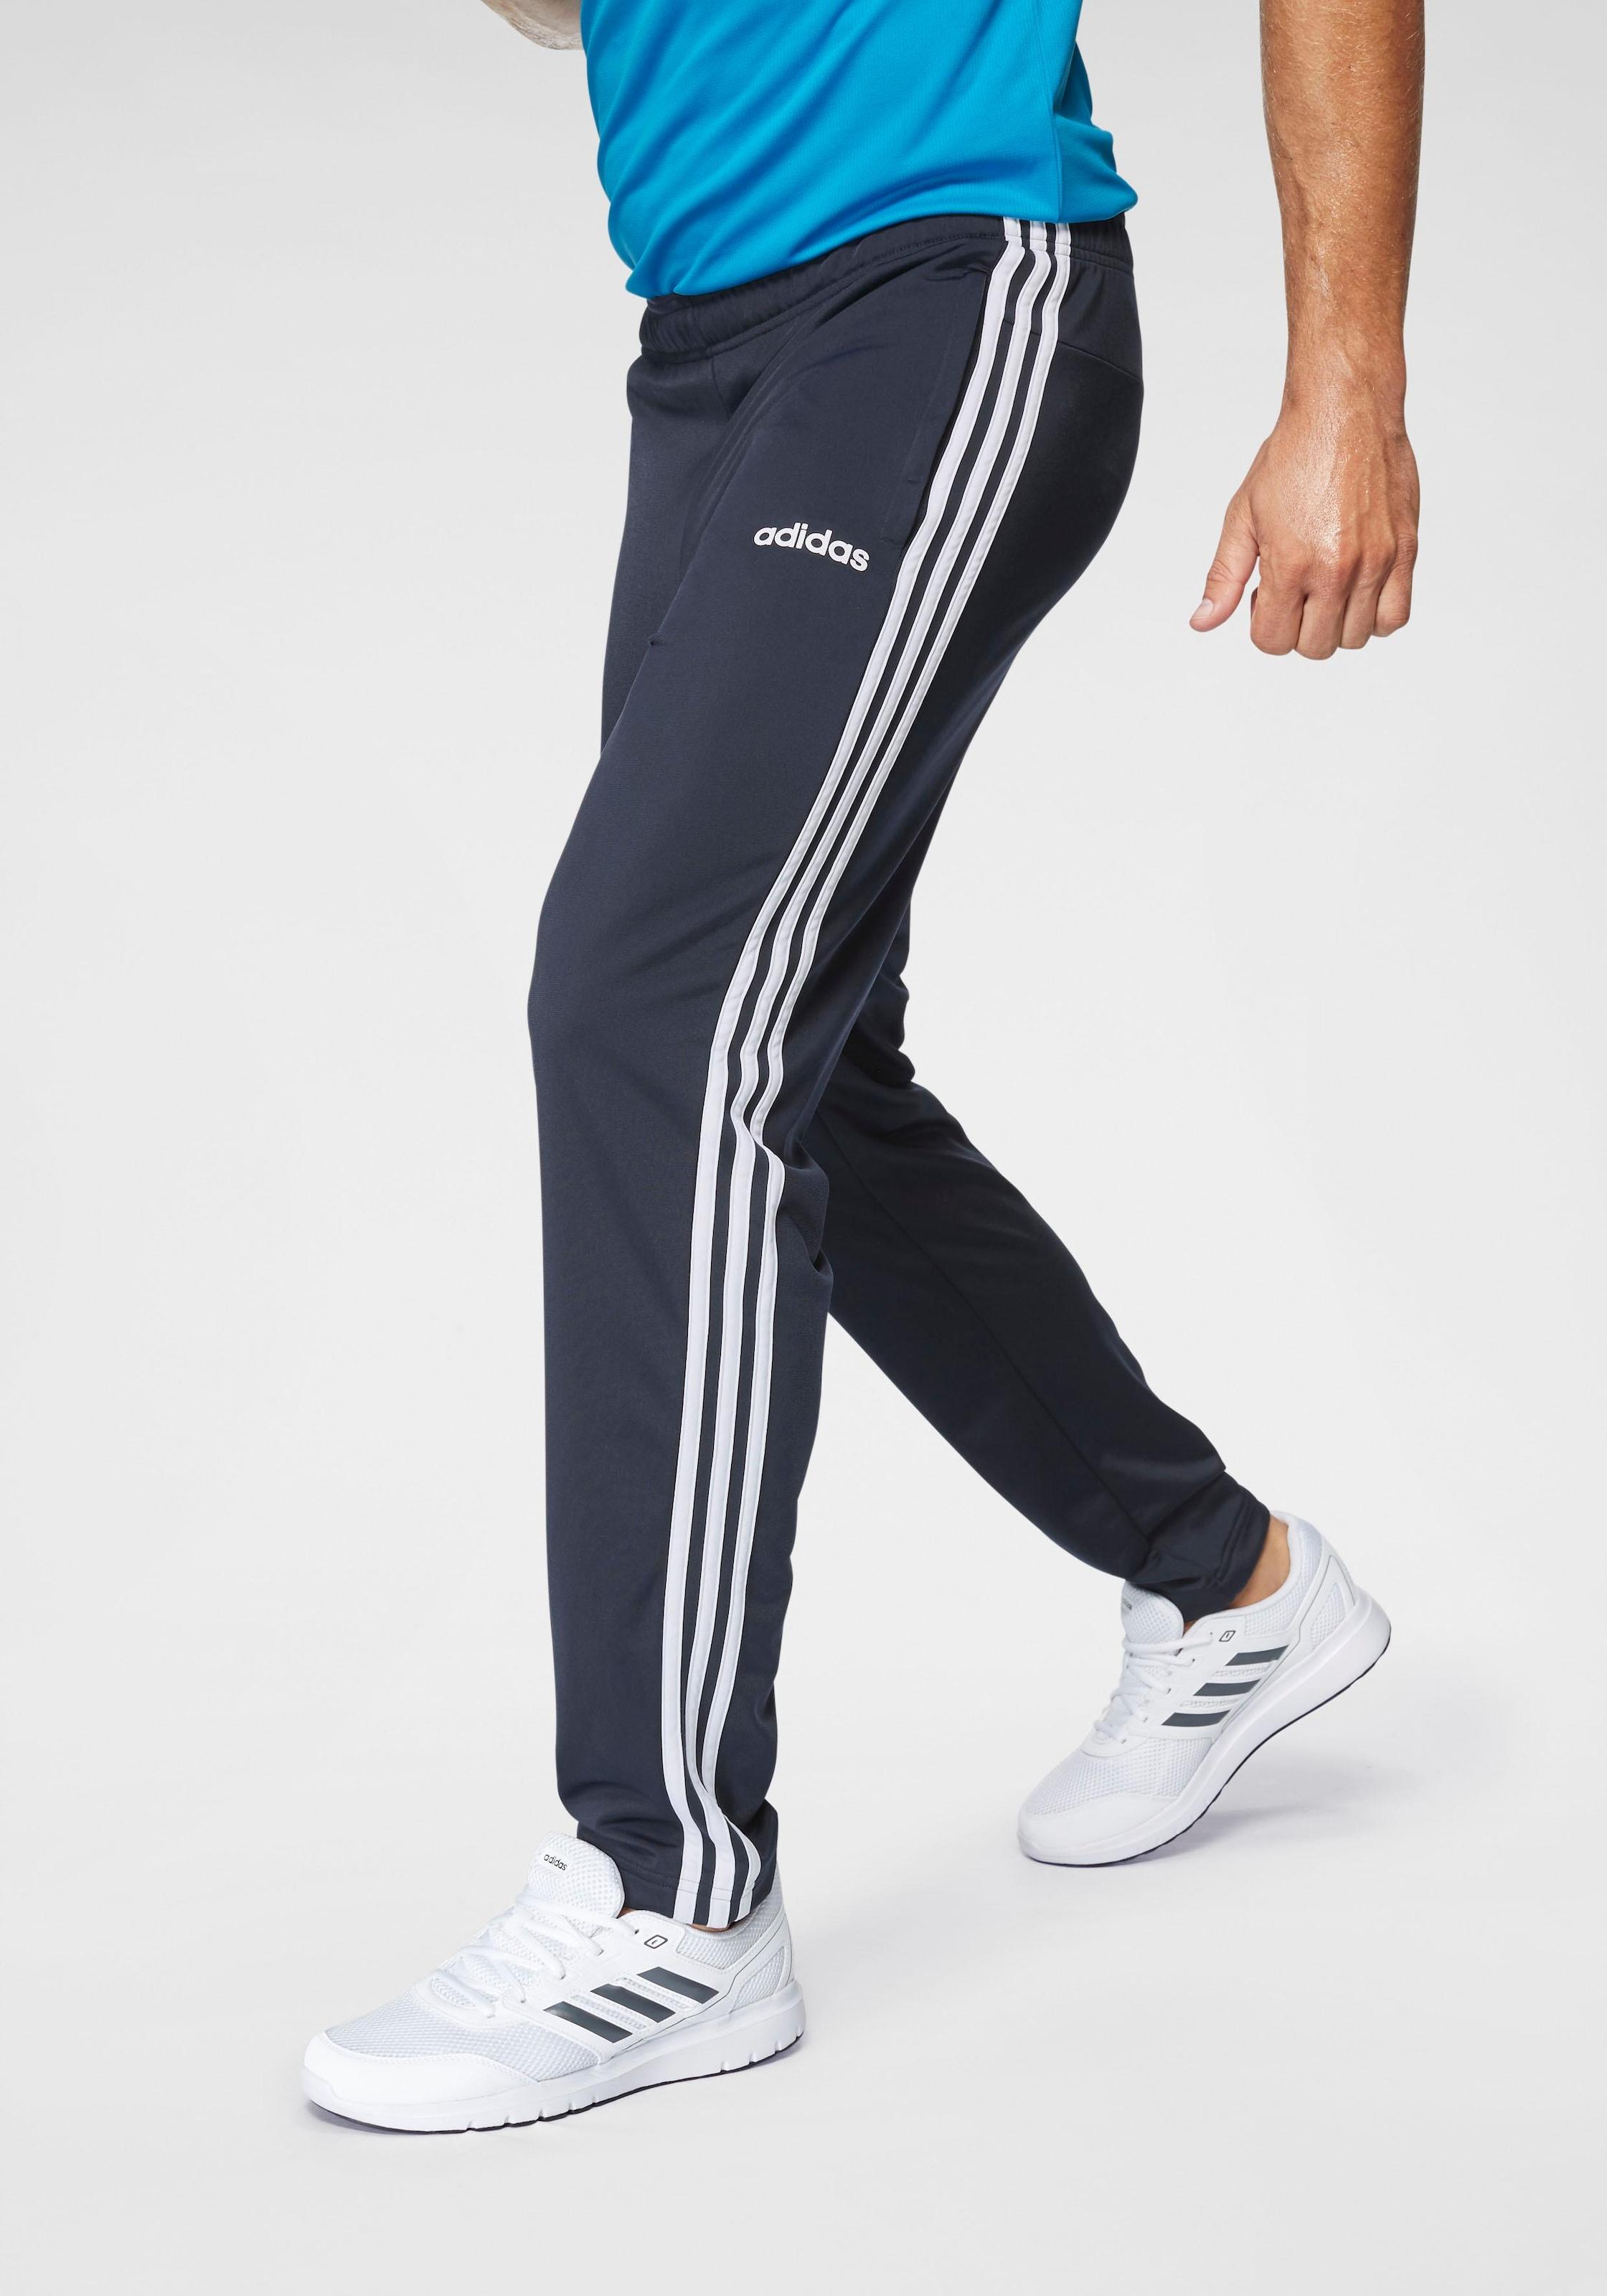 adidas Trainingshose »E 3 STRIPES TRACK PANT TRIC« online kaufen | BAUR